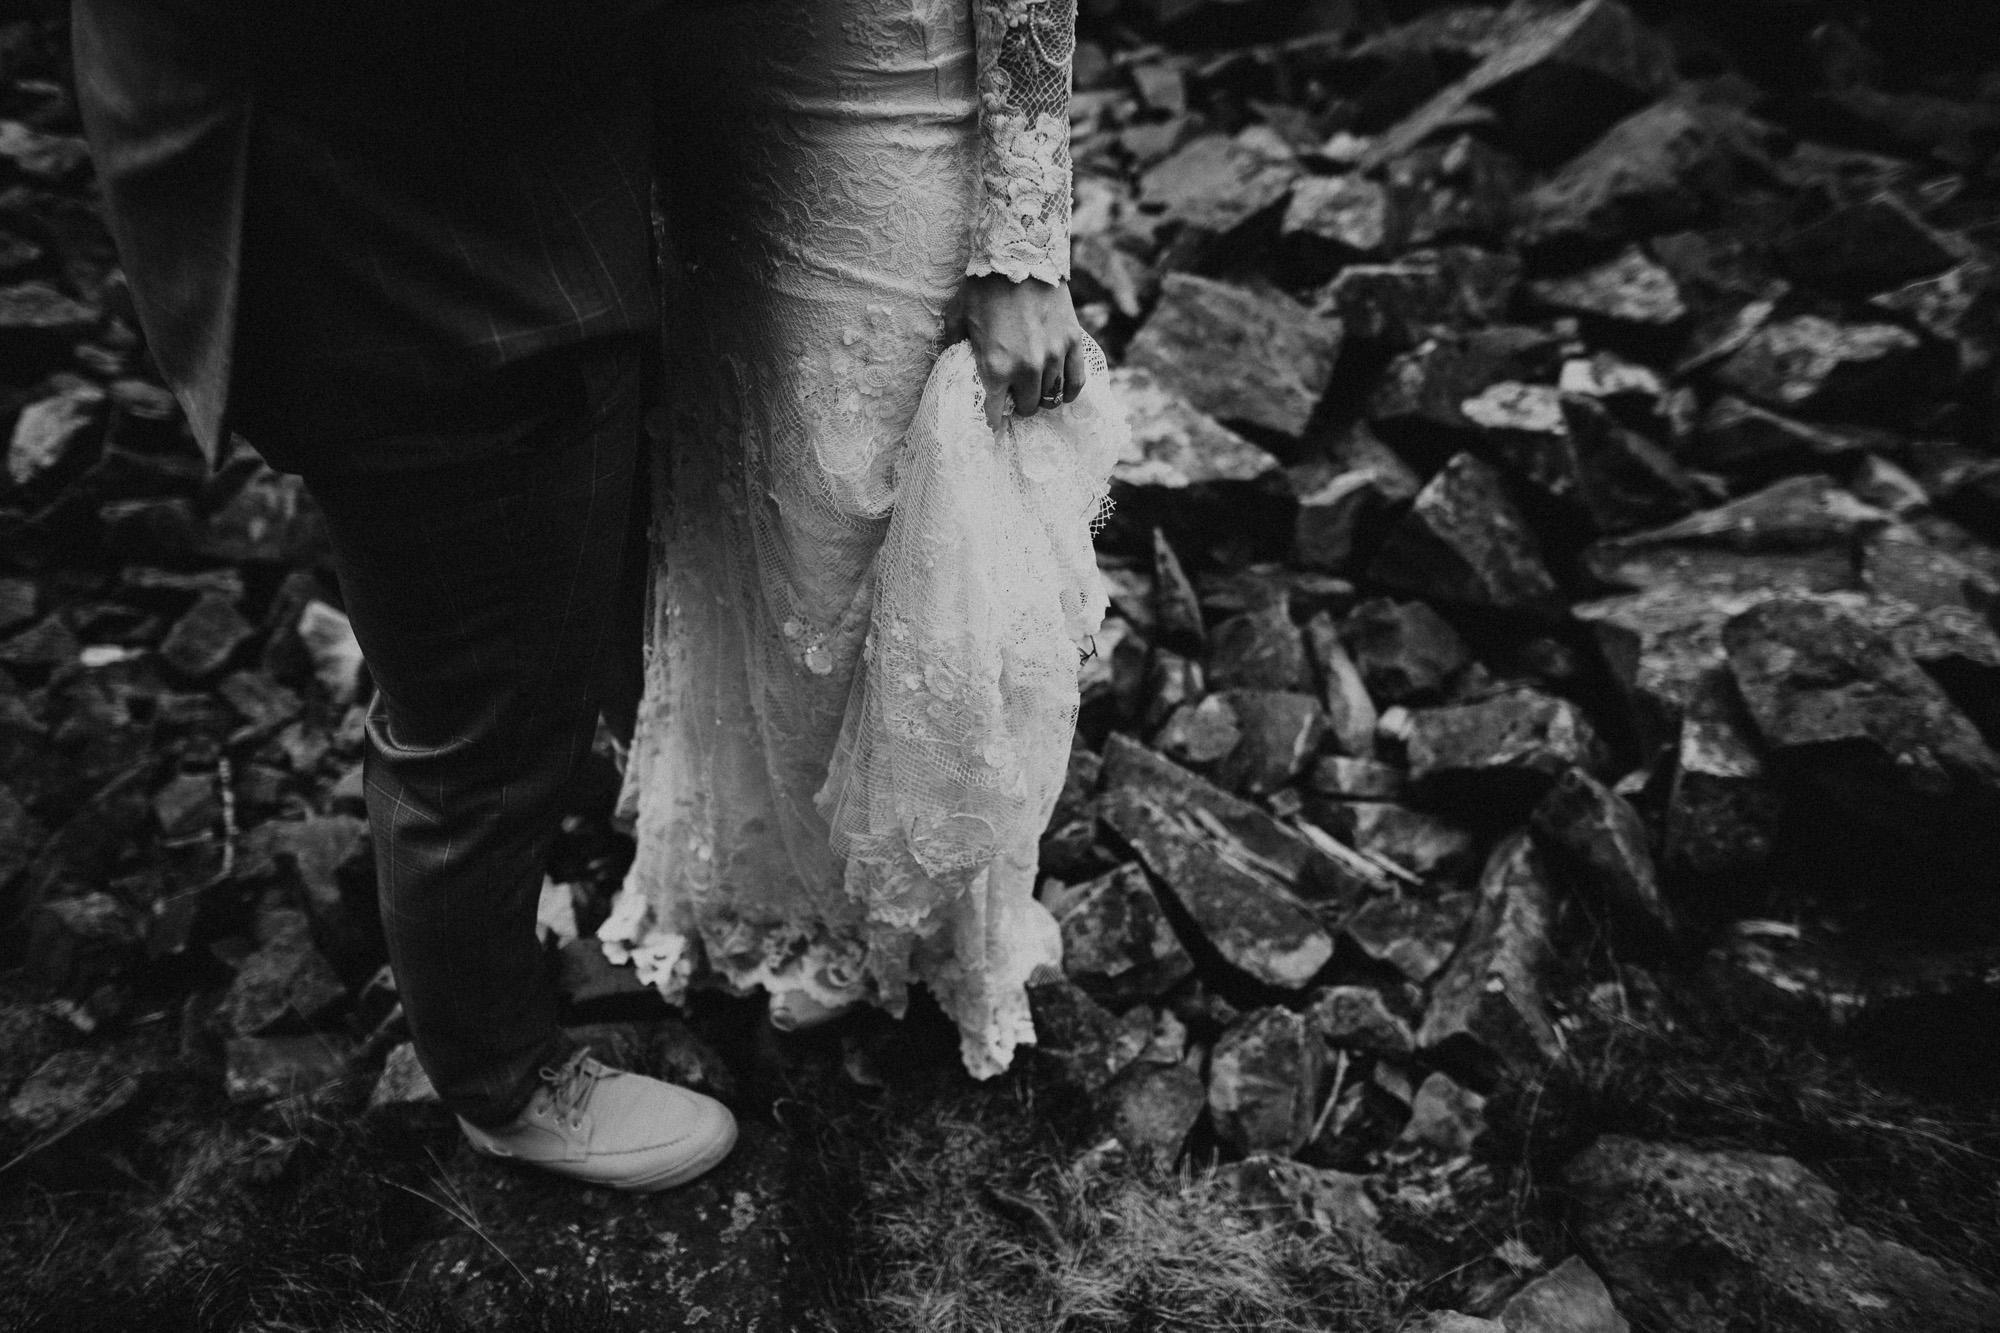 DanielaMarquardtPhotography_Hochzeitsfotograf_Düsseldorf_Köln_Mallorca_Bayern_Austria_Harz_LinaundMaik_Afterwedding-Shooting_Weddingphotographer_Ibiza_Tuskany_Italien_Toskana92